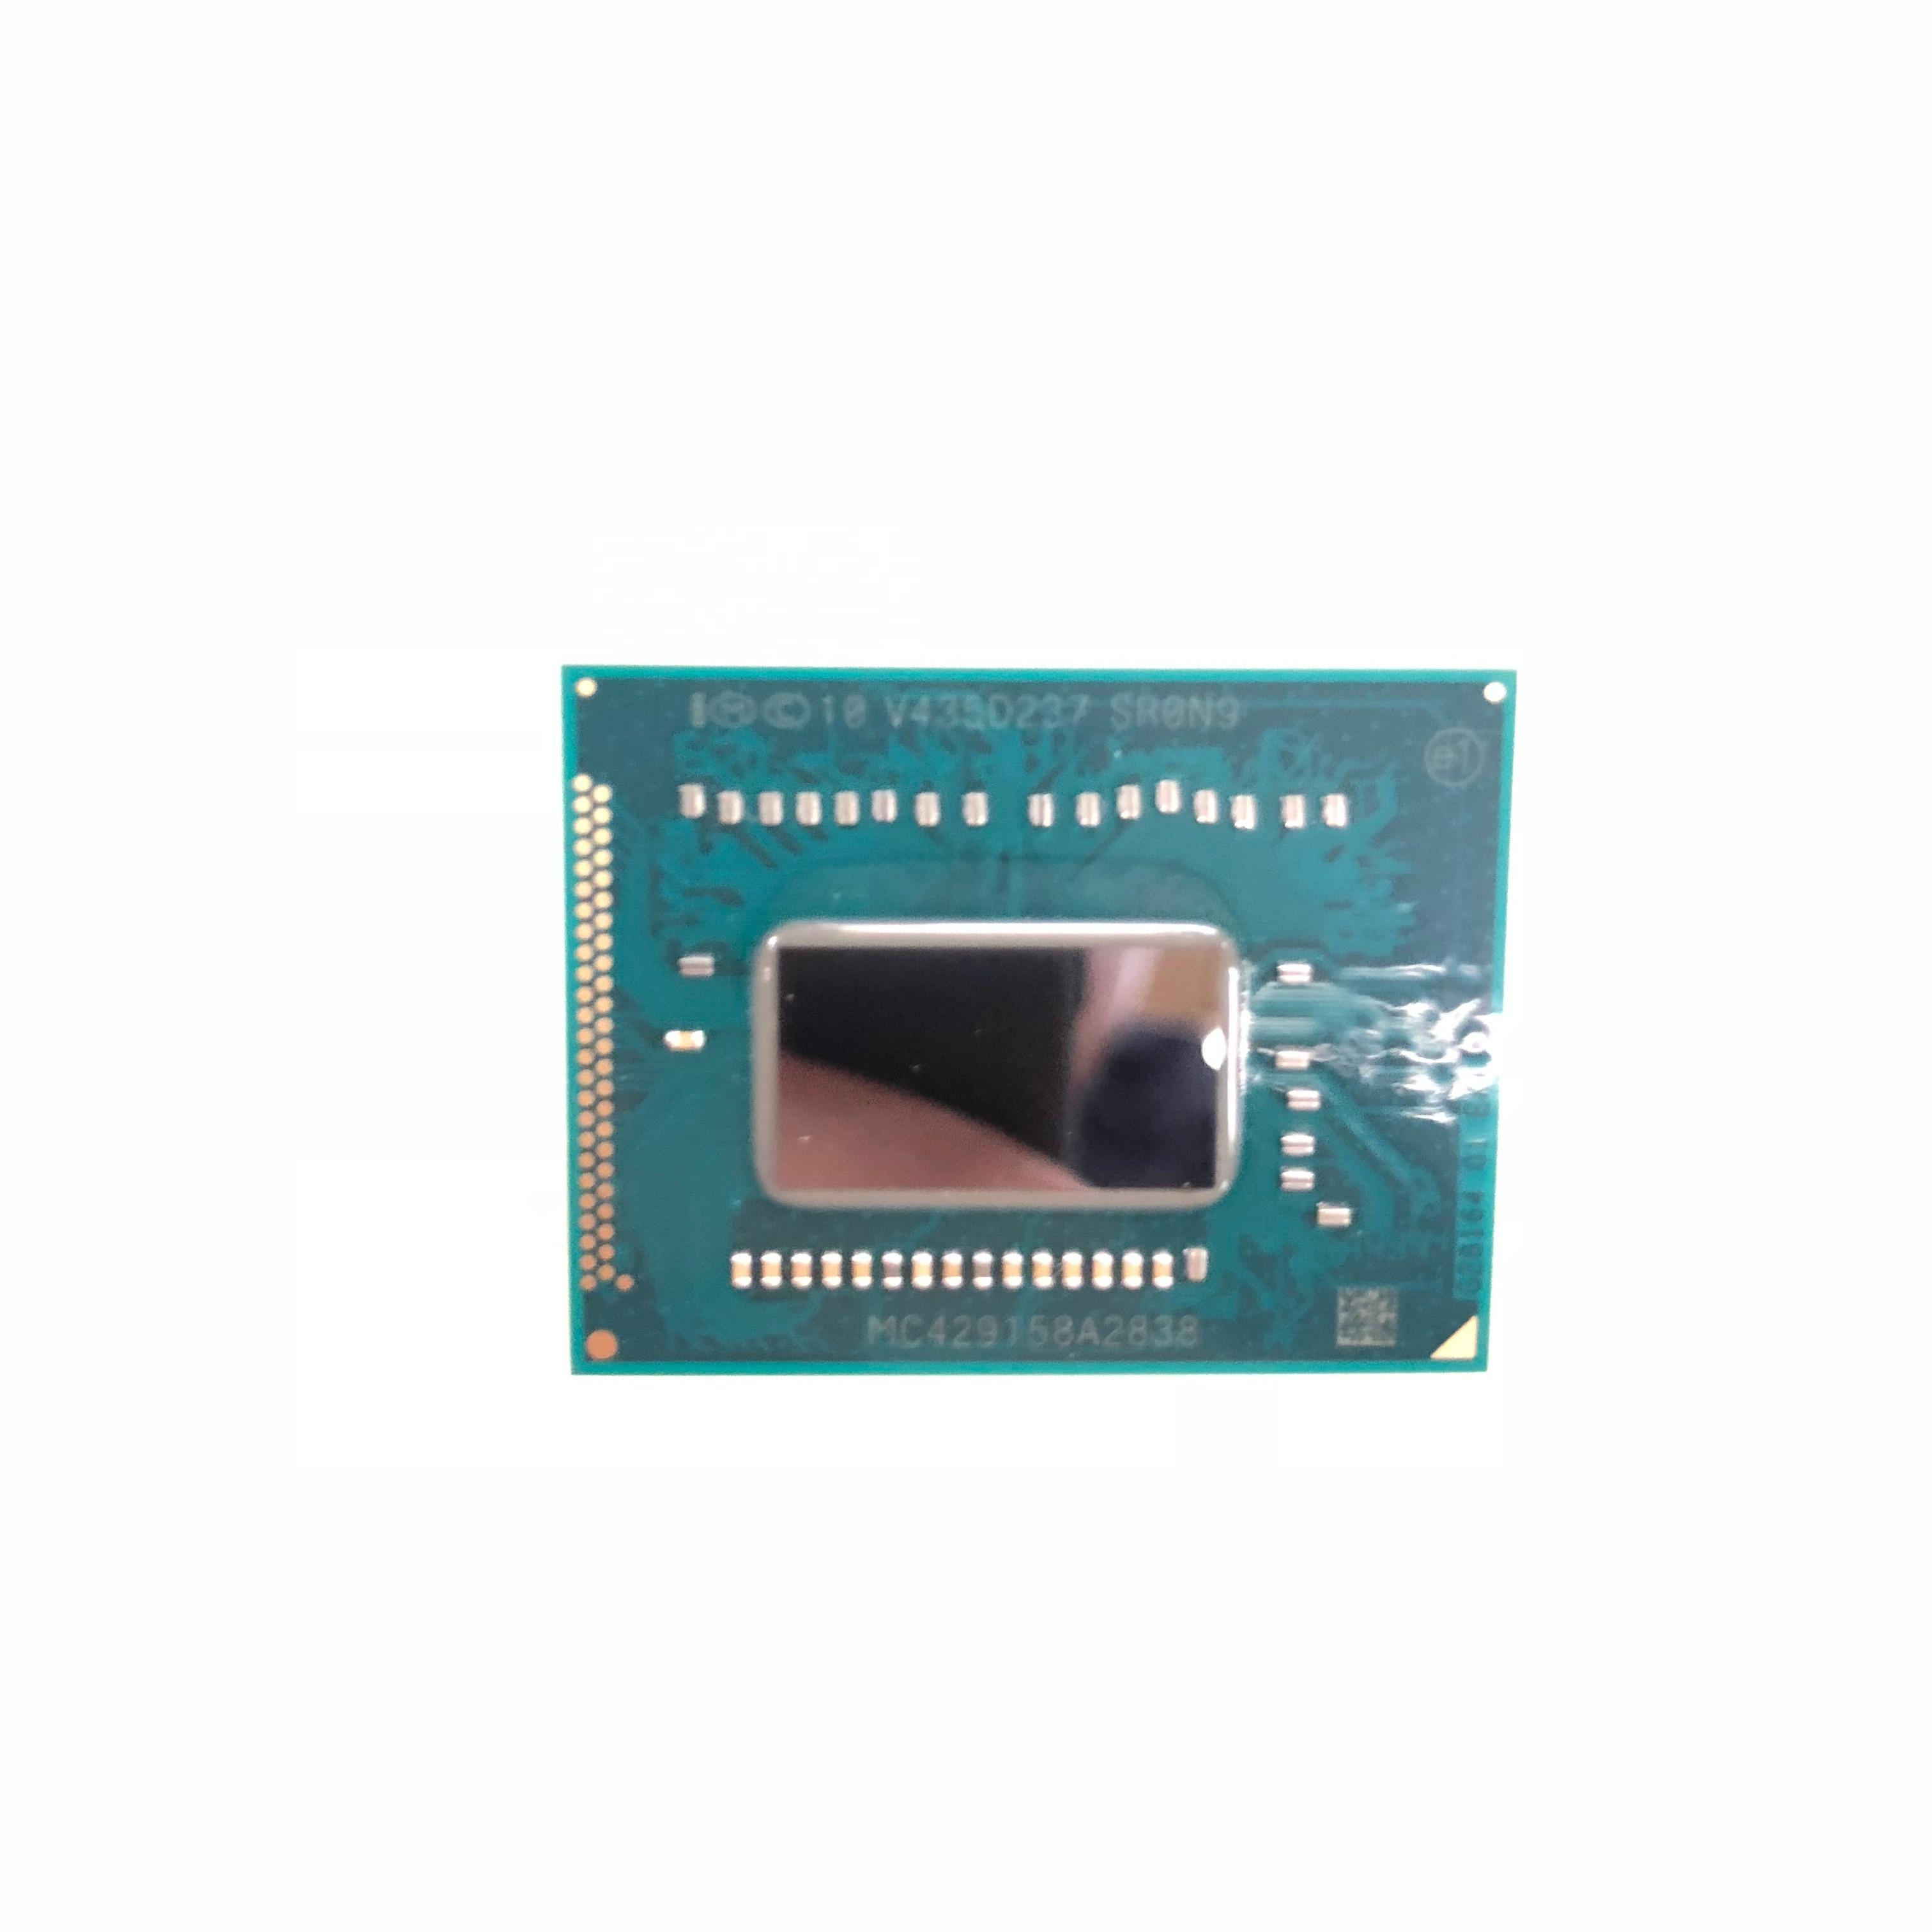 Intel Core I3 3217u Processor Cpu Sr0n9 Av8063801058401 2core 4thread 1 8ghz 3mb 22nm 17w Fcbga1023 Buy I3 3217u Sr0n9 Core I3 Processor Product On Alibaba Com